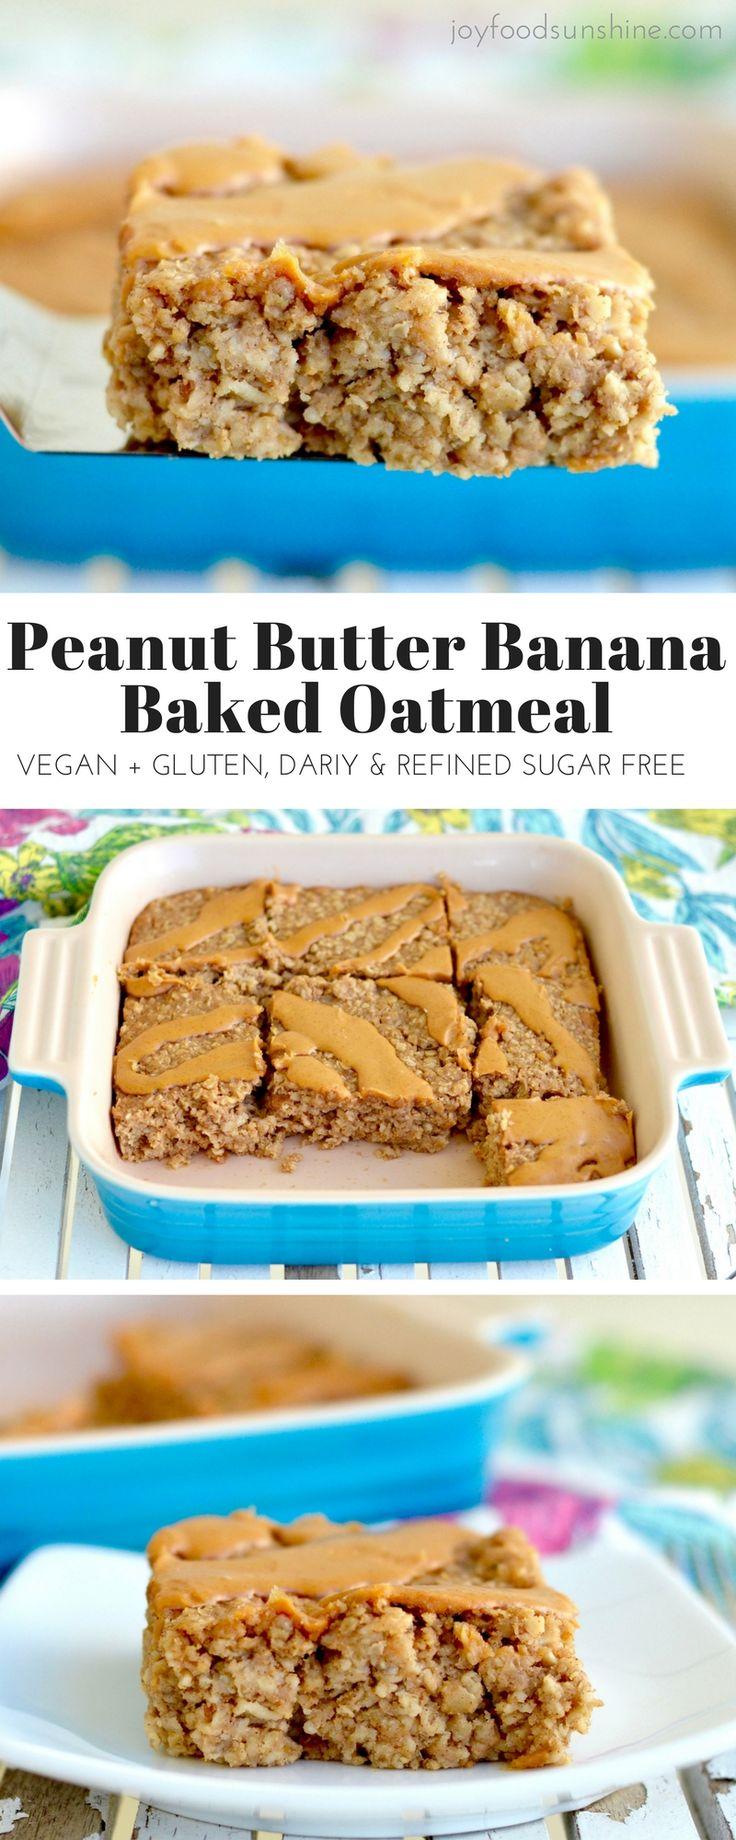 Healthy Peanut Butter Banana Baked Oatmeal Recipe! The perfect make-ahead breakfast! Gluten-free, dairy-free, & vegan-friendly with zero refined sugar!